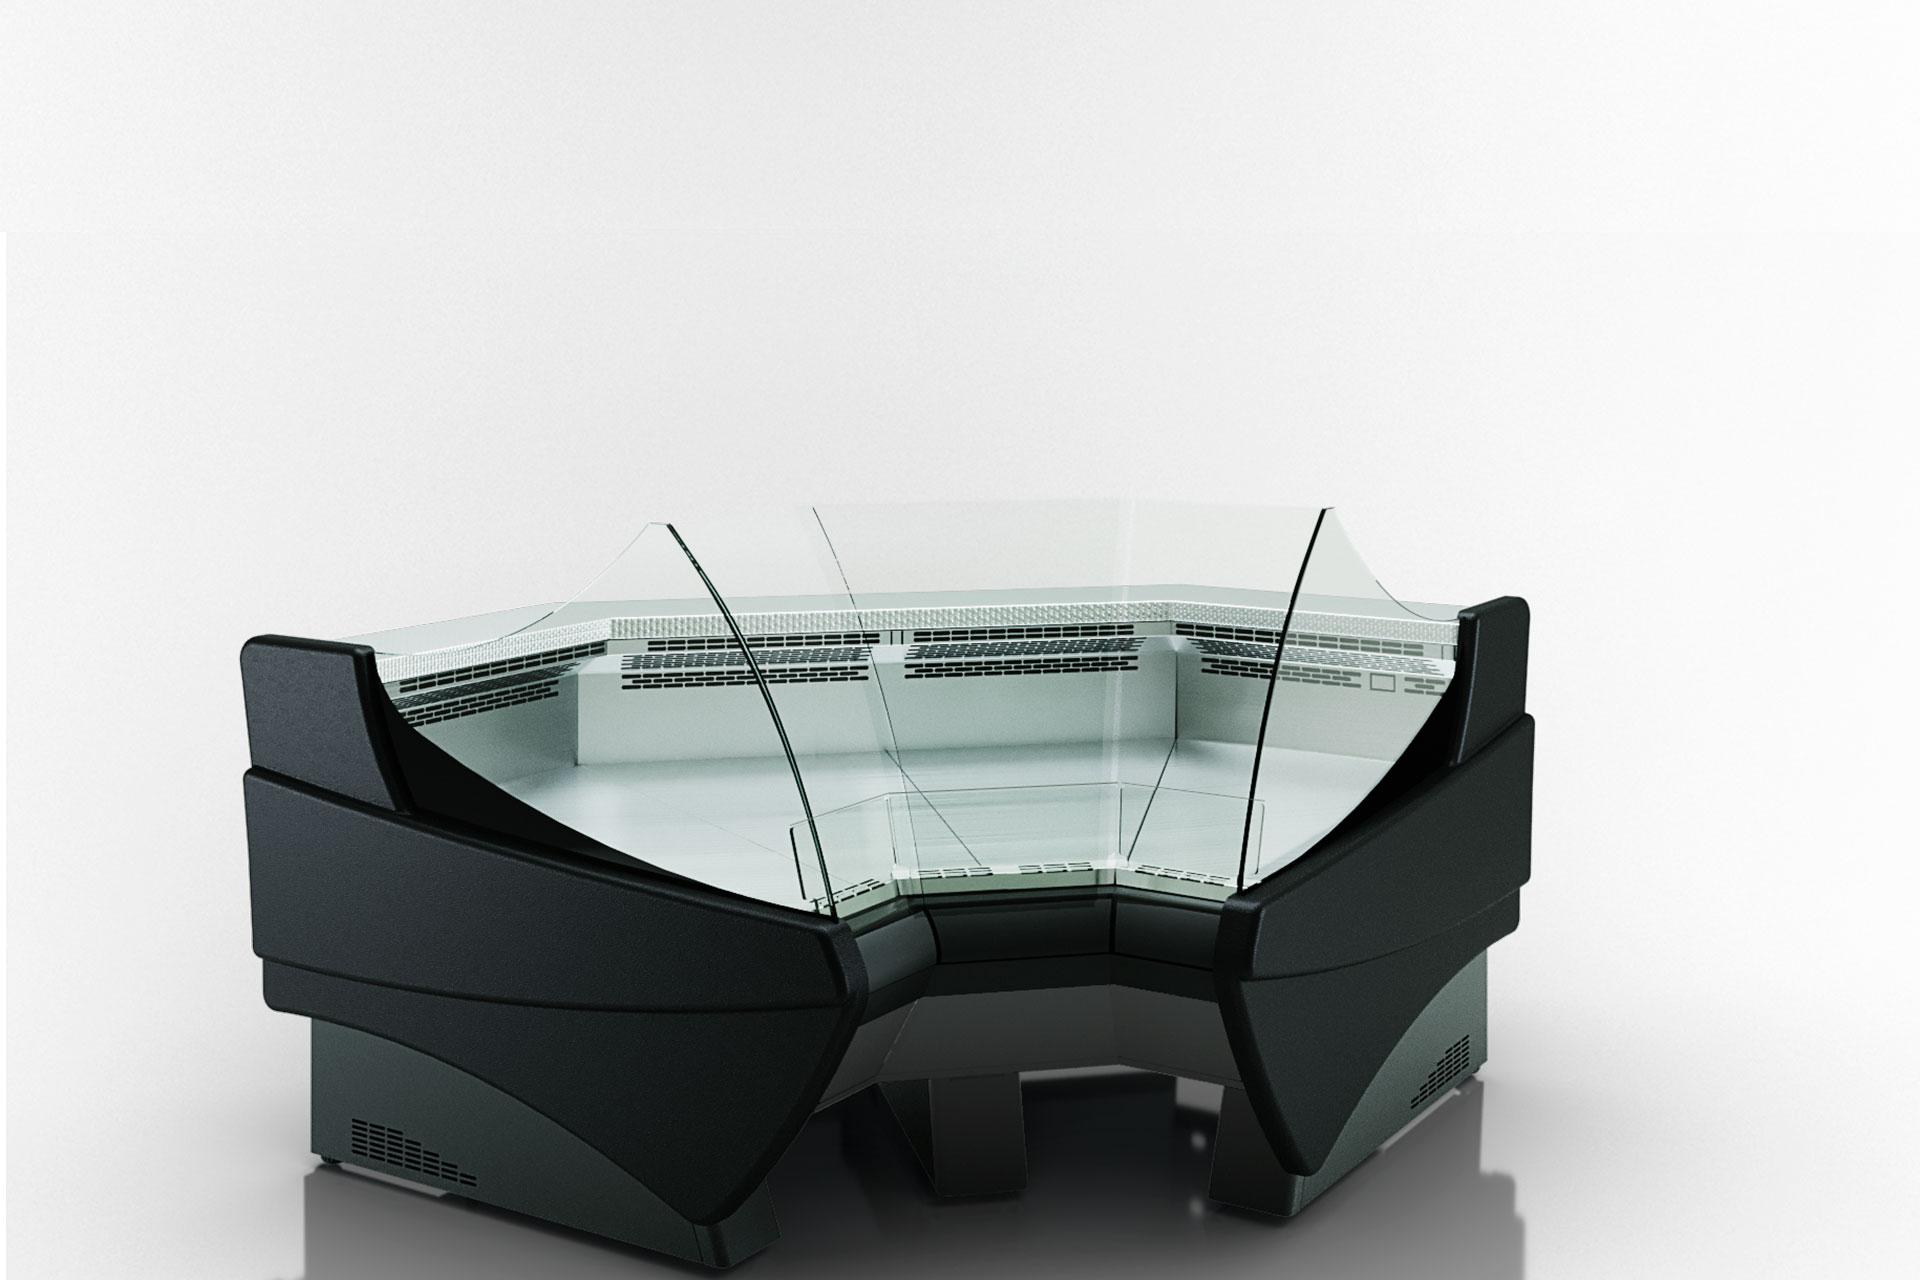 Вітрина Symphony luxe MG 120 deli T2 110-DLM-IS90